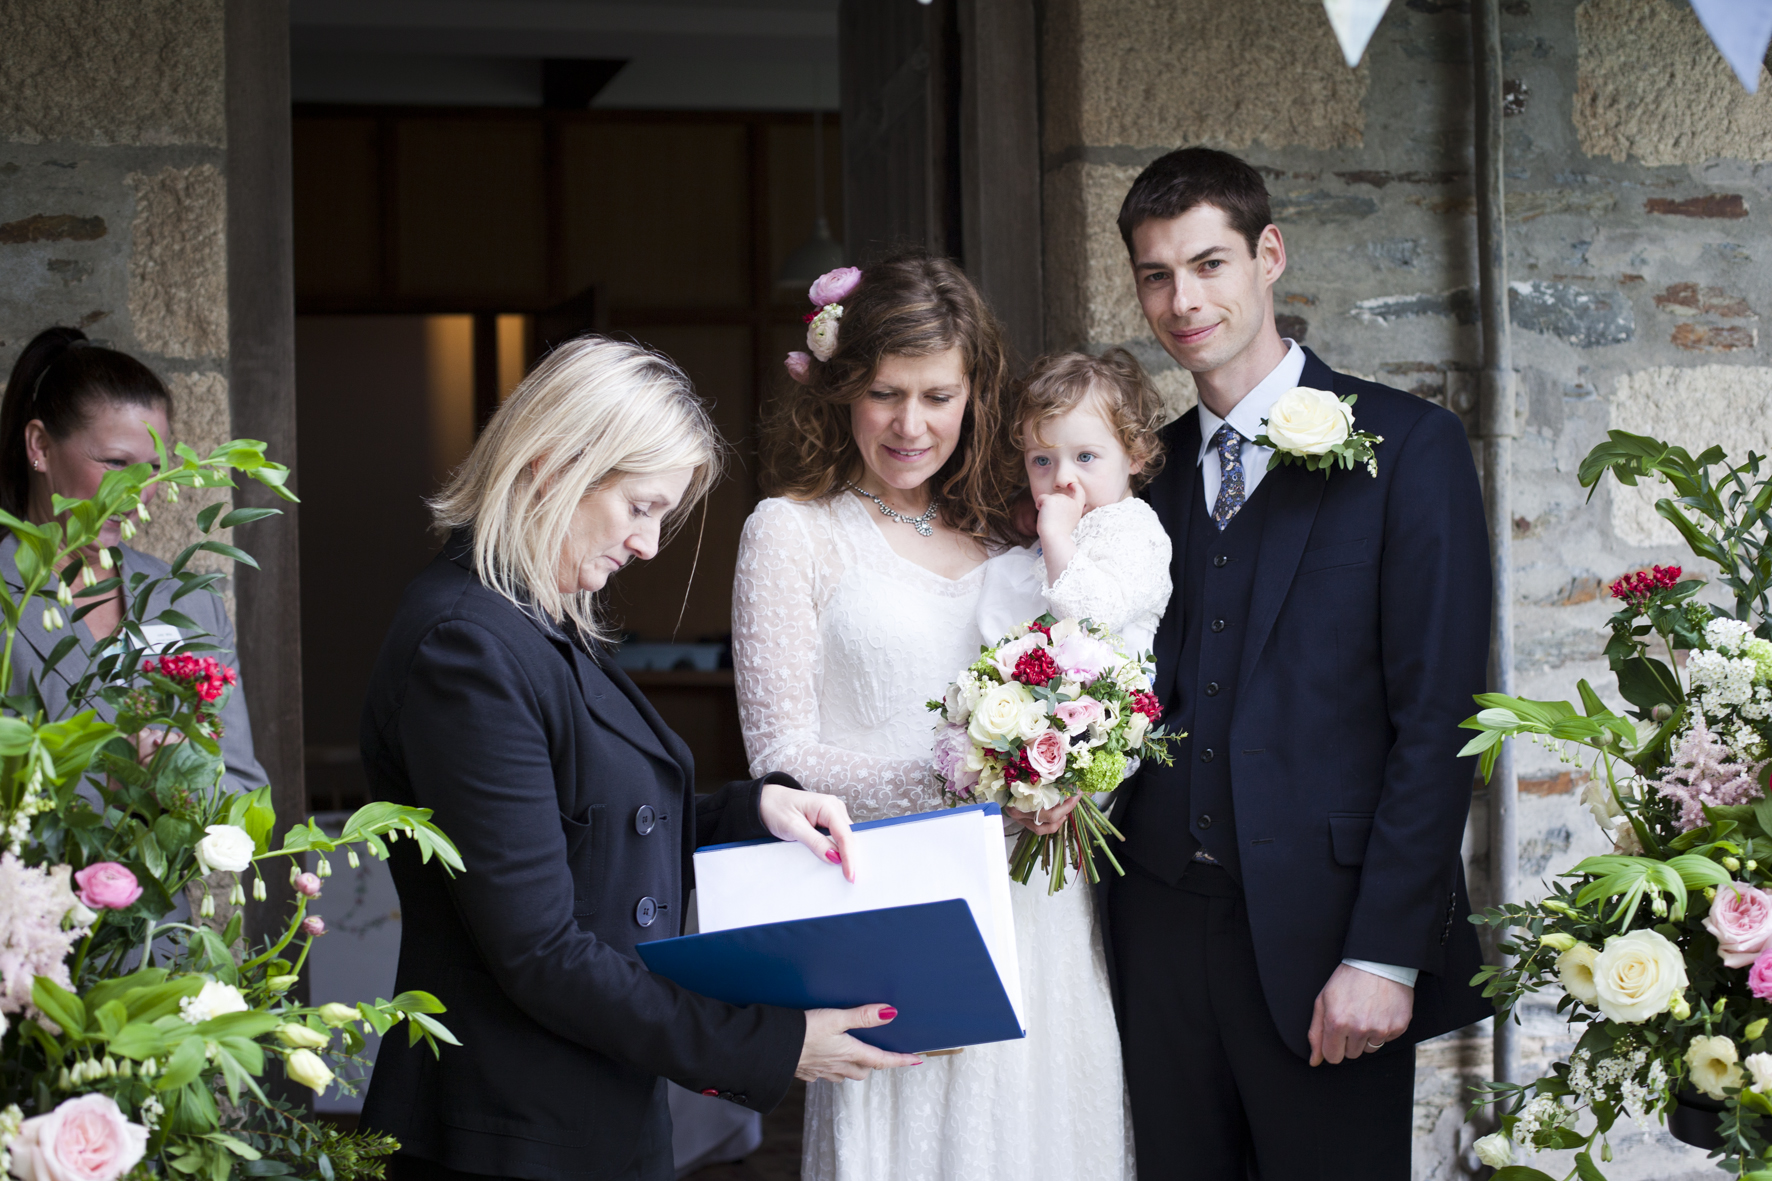 Wedding example_M&P__MG_3533_Claudia Leisinger.jpg